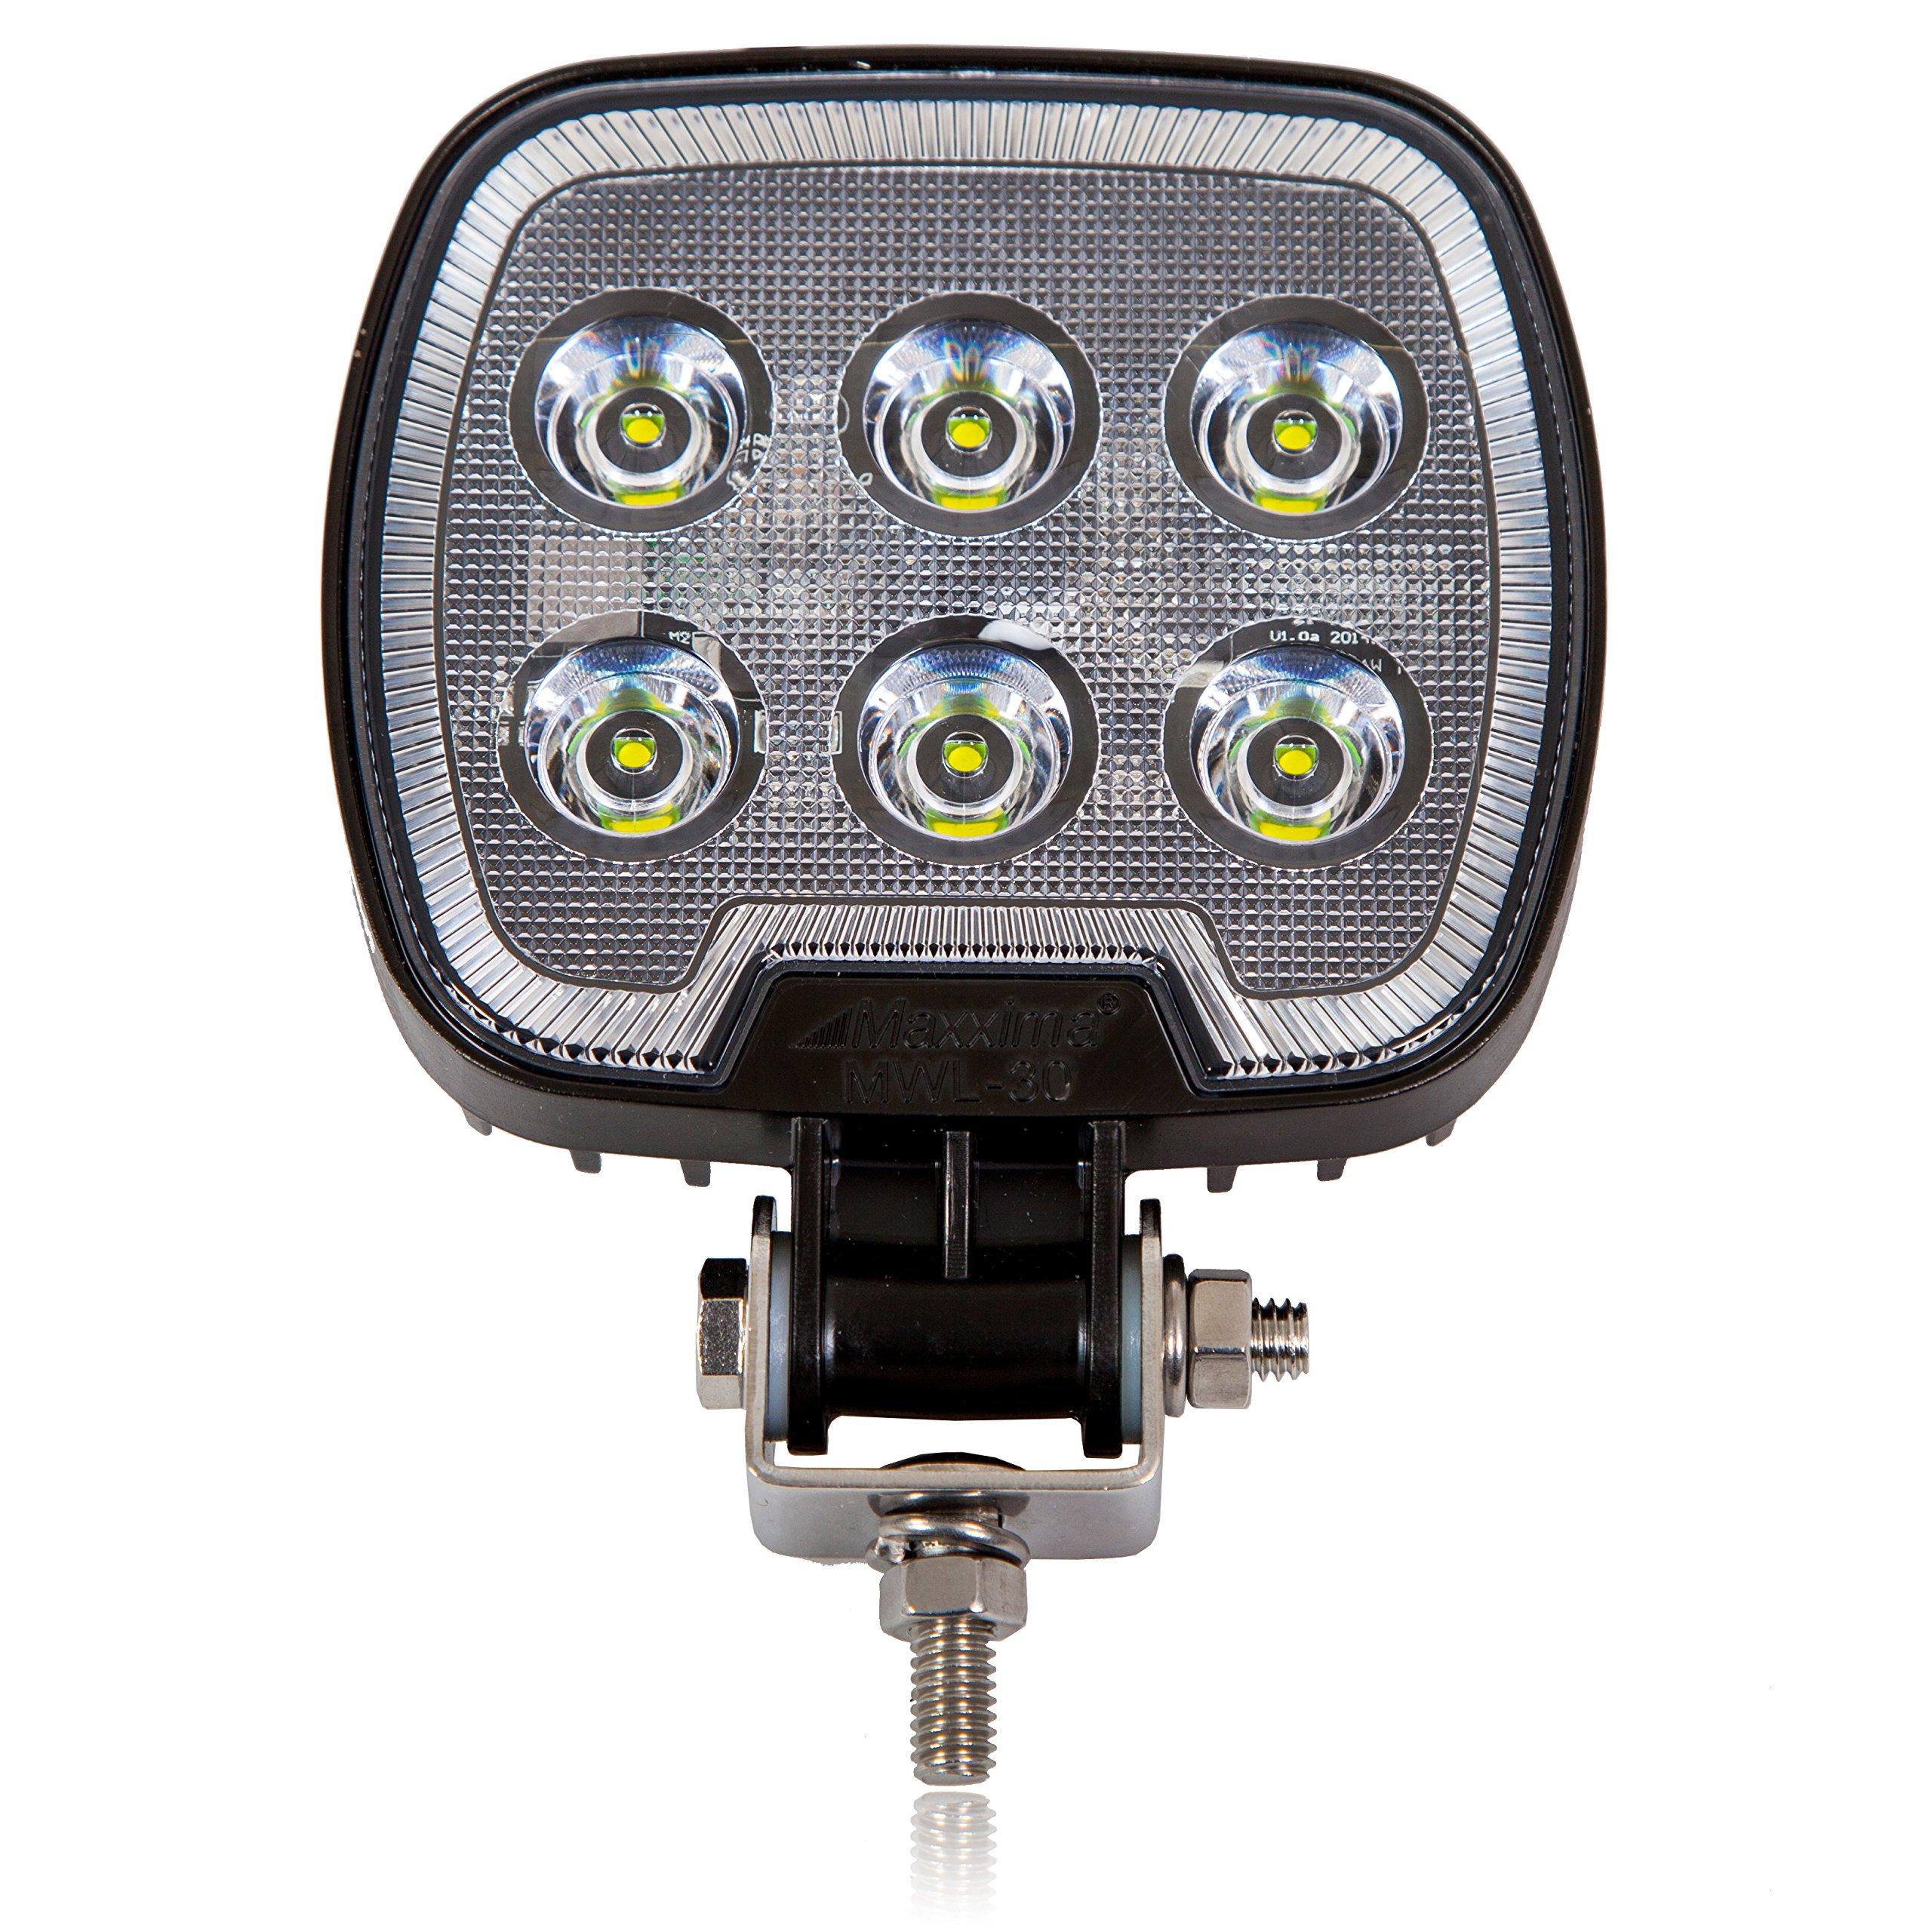 Maxxima MWL-30 6 LED Square Work Light 1,200 Lumens